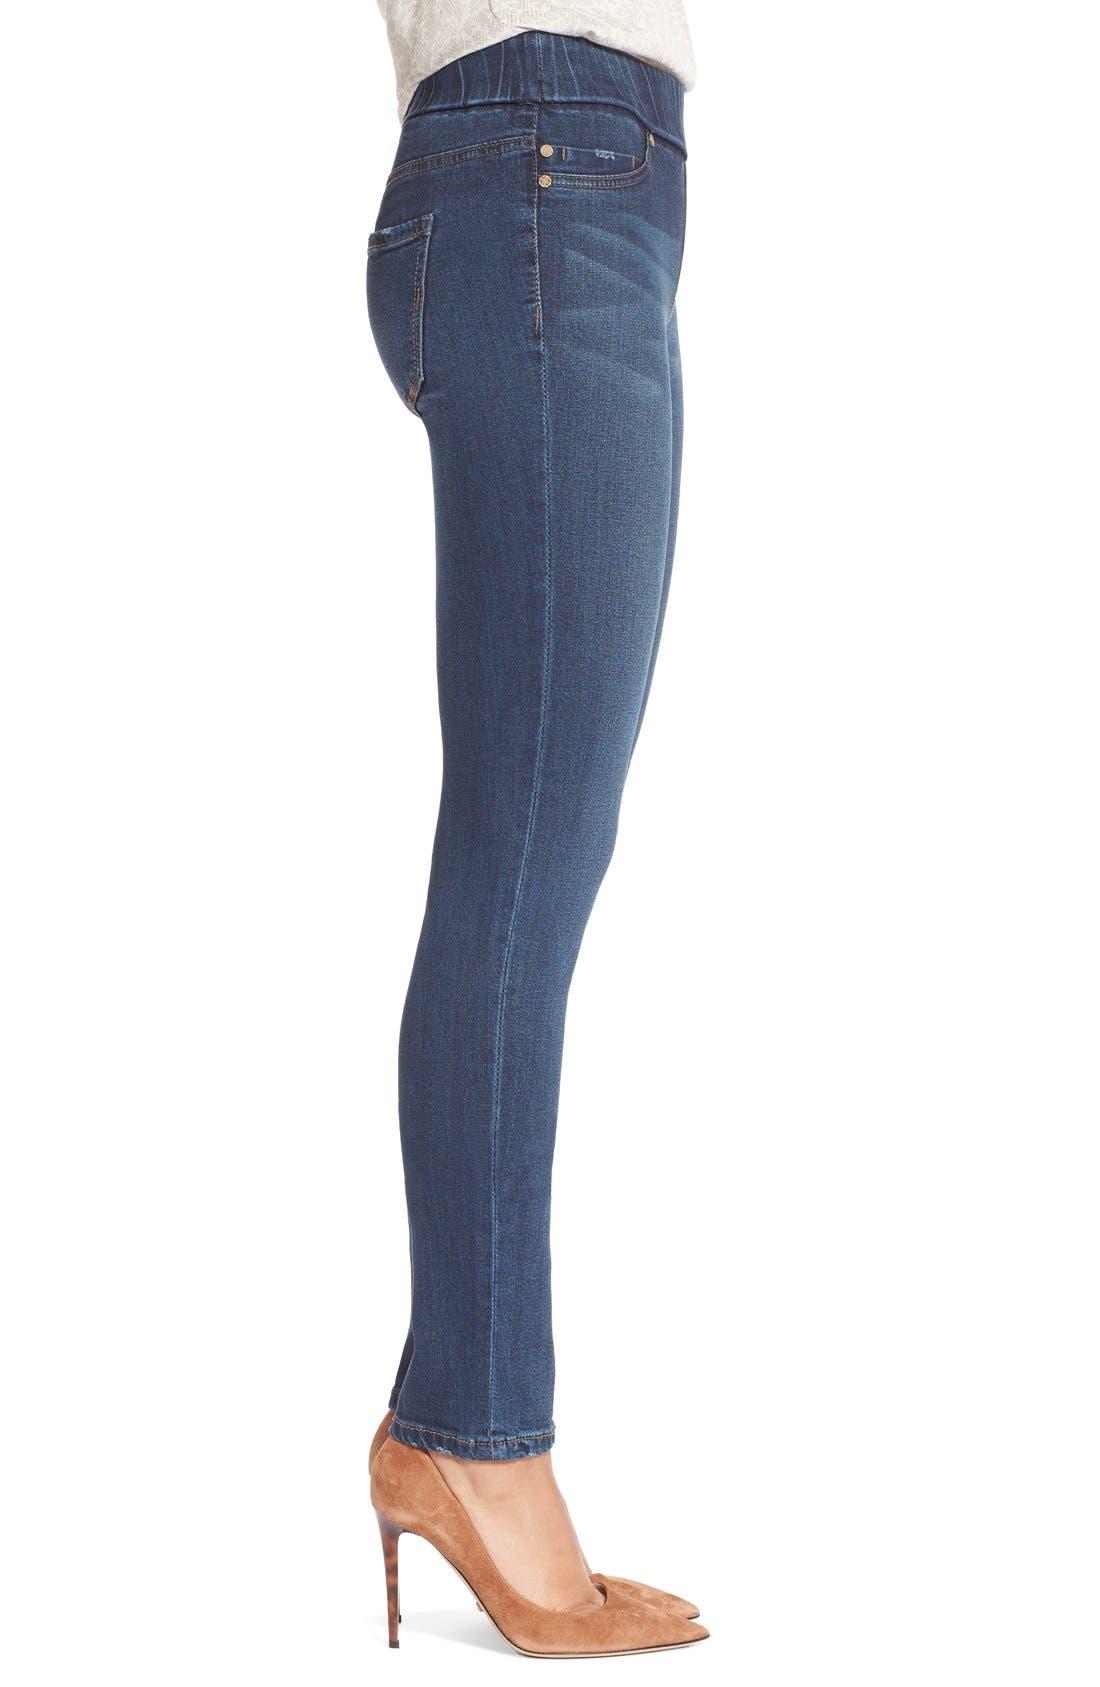 Sienna Pull-On Knit Denim Leggings,                             Alternate thumbnail 3, color,                             Petrol Wash